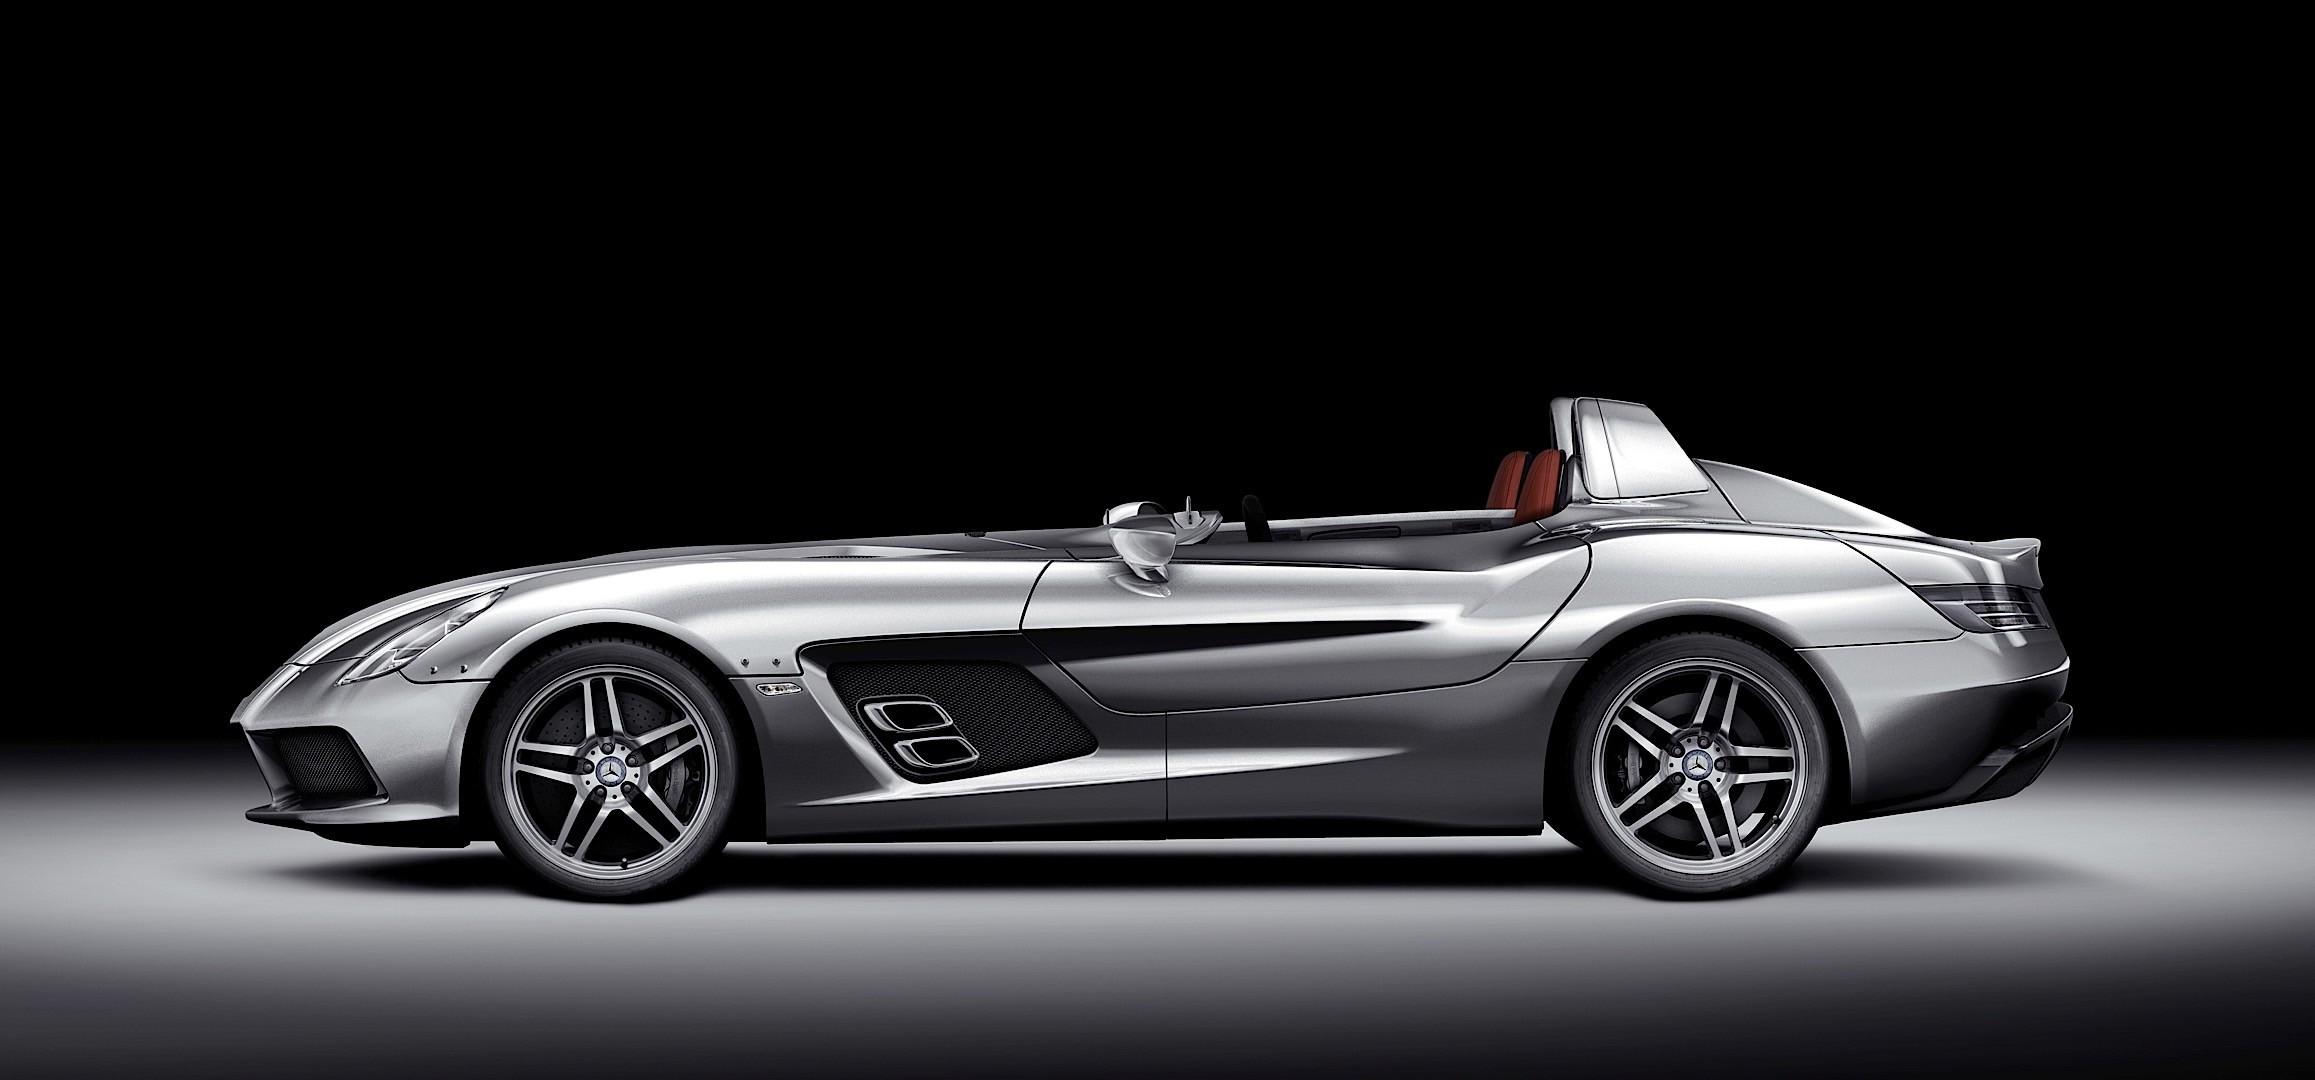 Mercedes benz slr stirling moss 2009 autoevolution for Mercedes benz mclaren slr